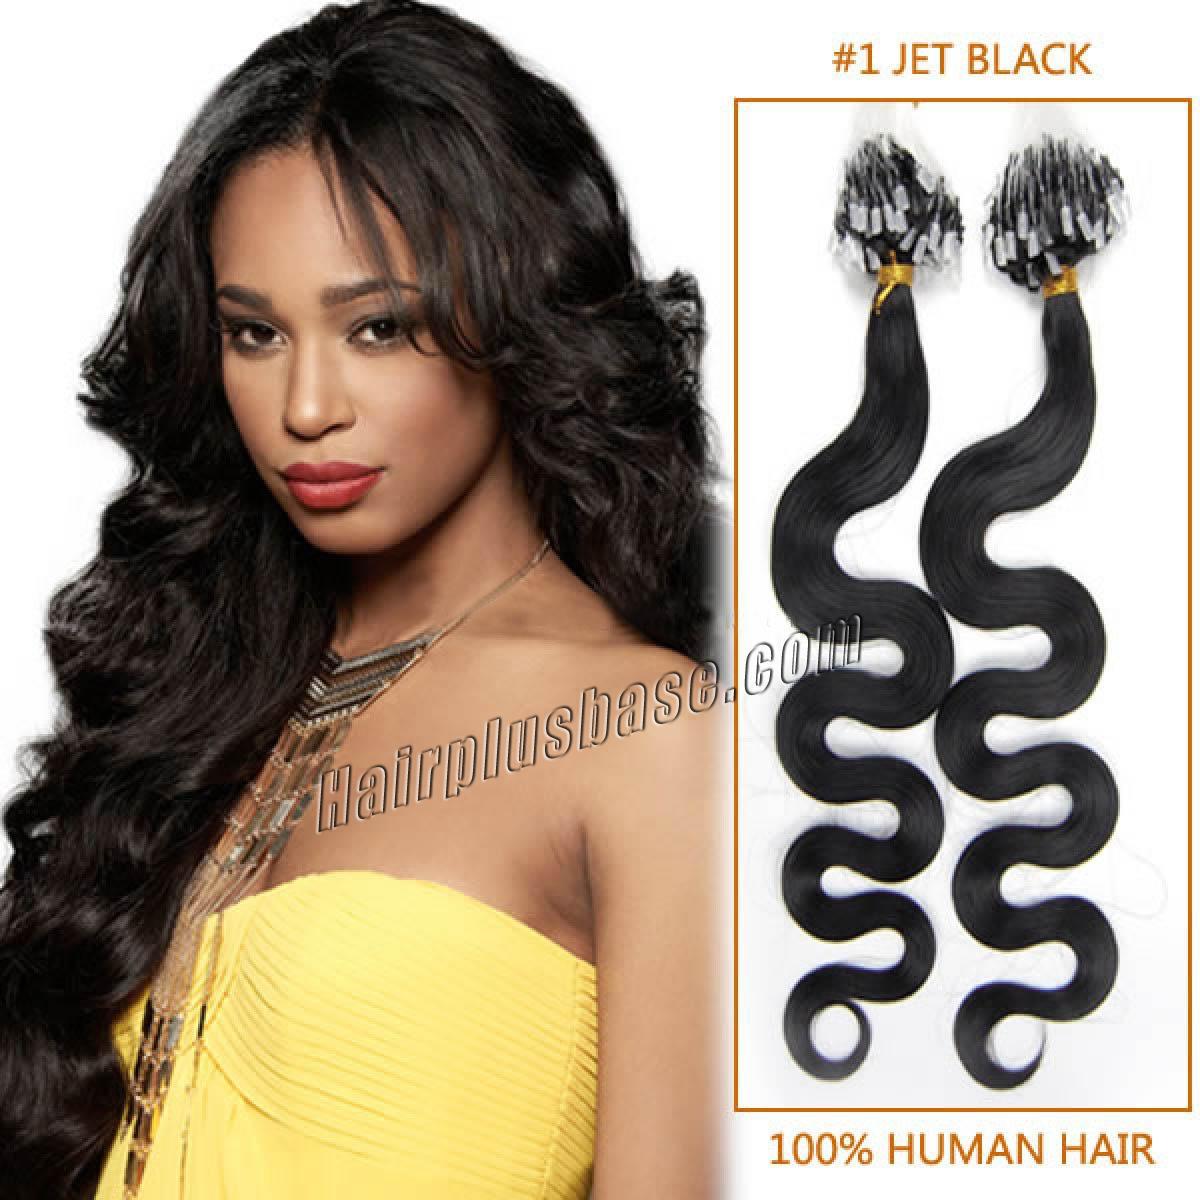 20 Inch 1 Jet Black Wavy Micro Loop Human Hair Extensions 100s 100g